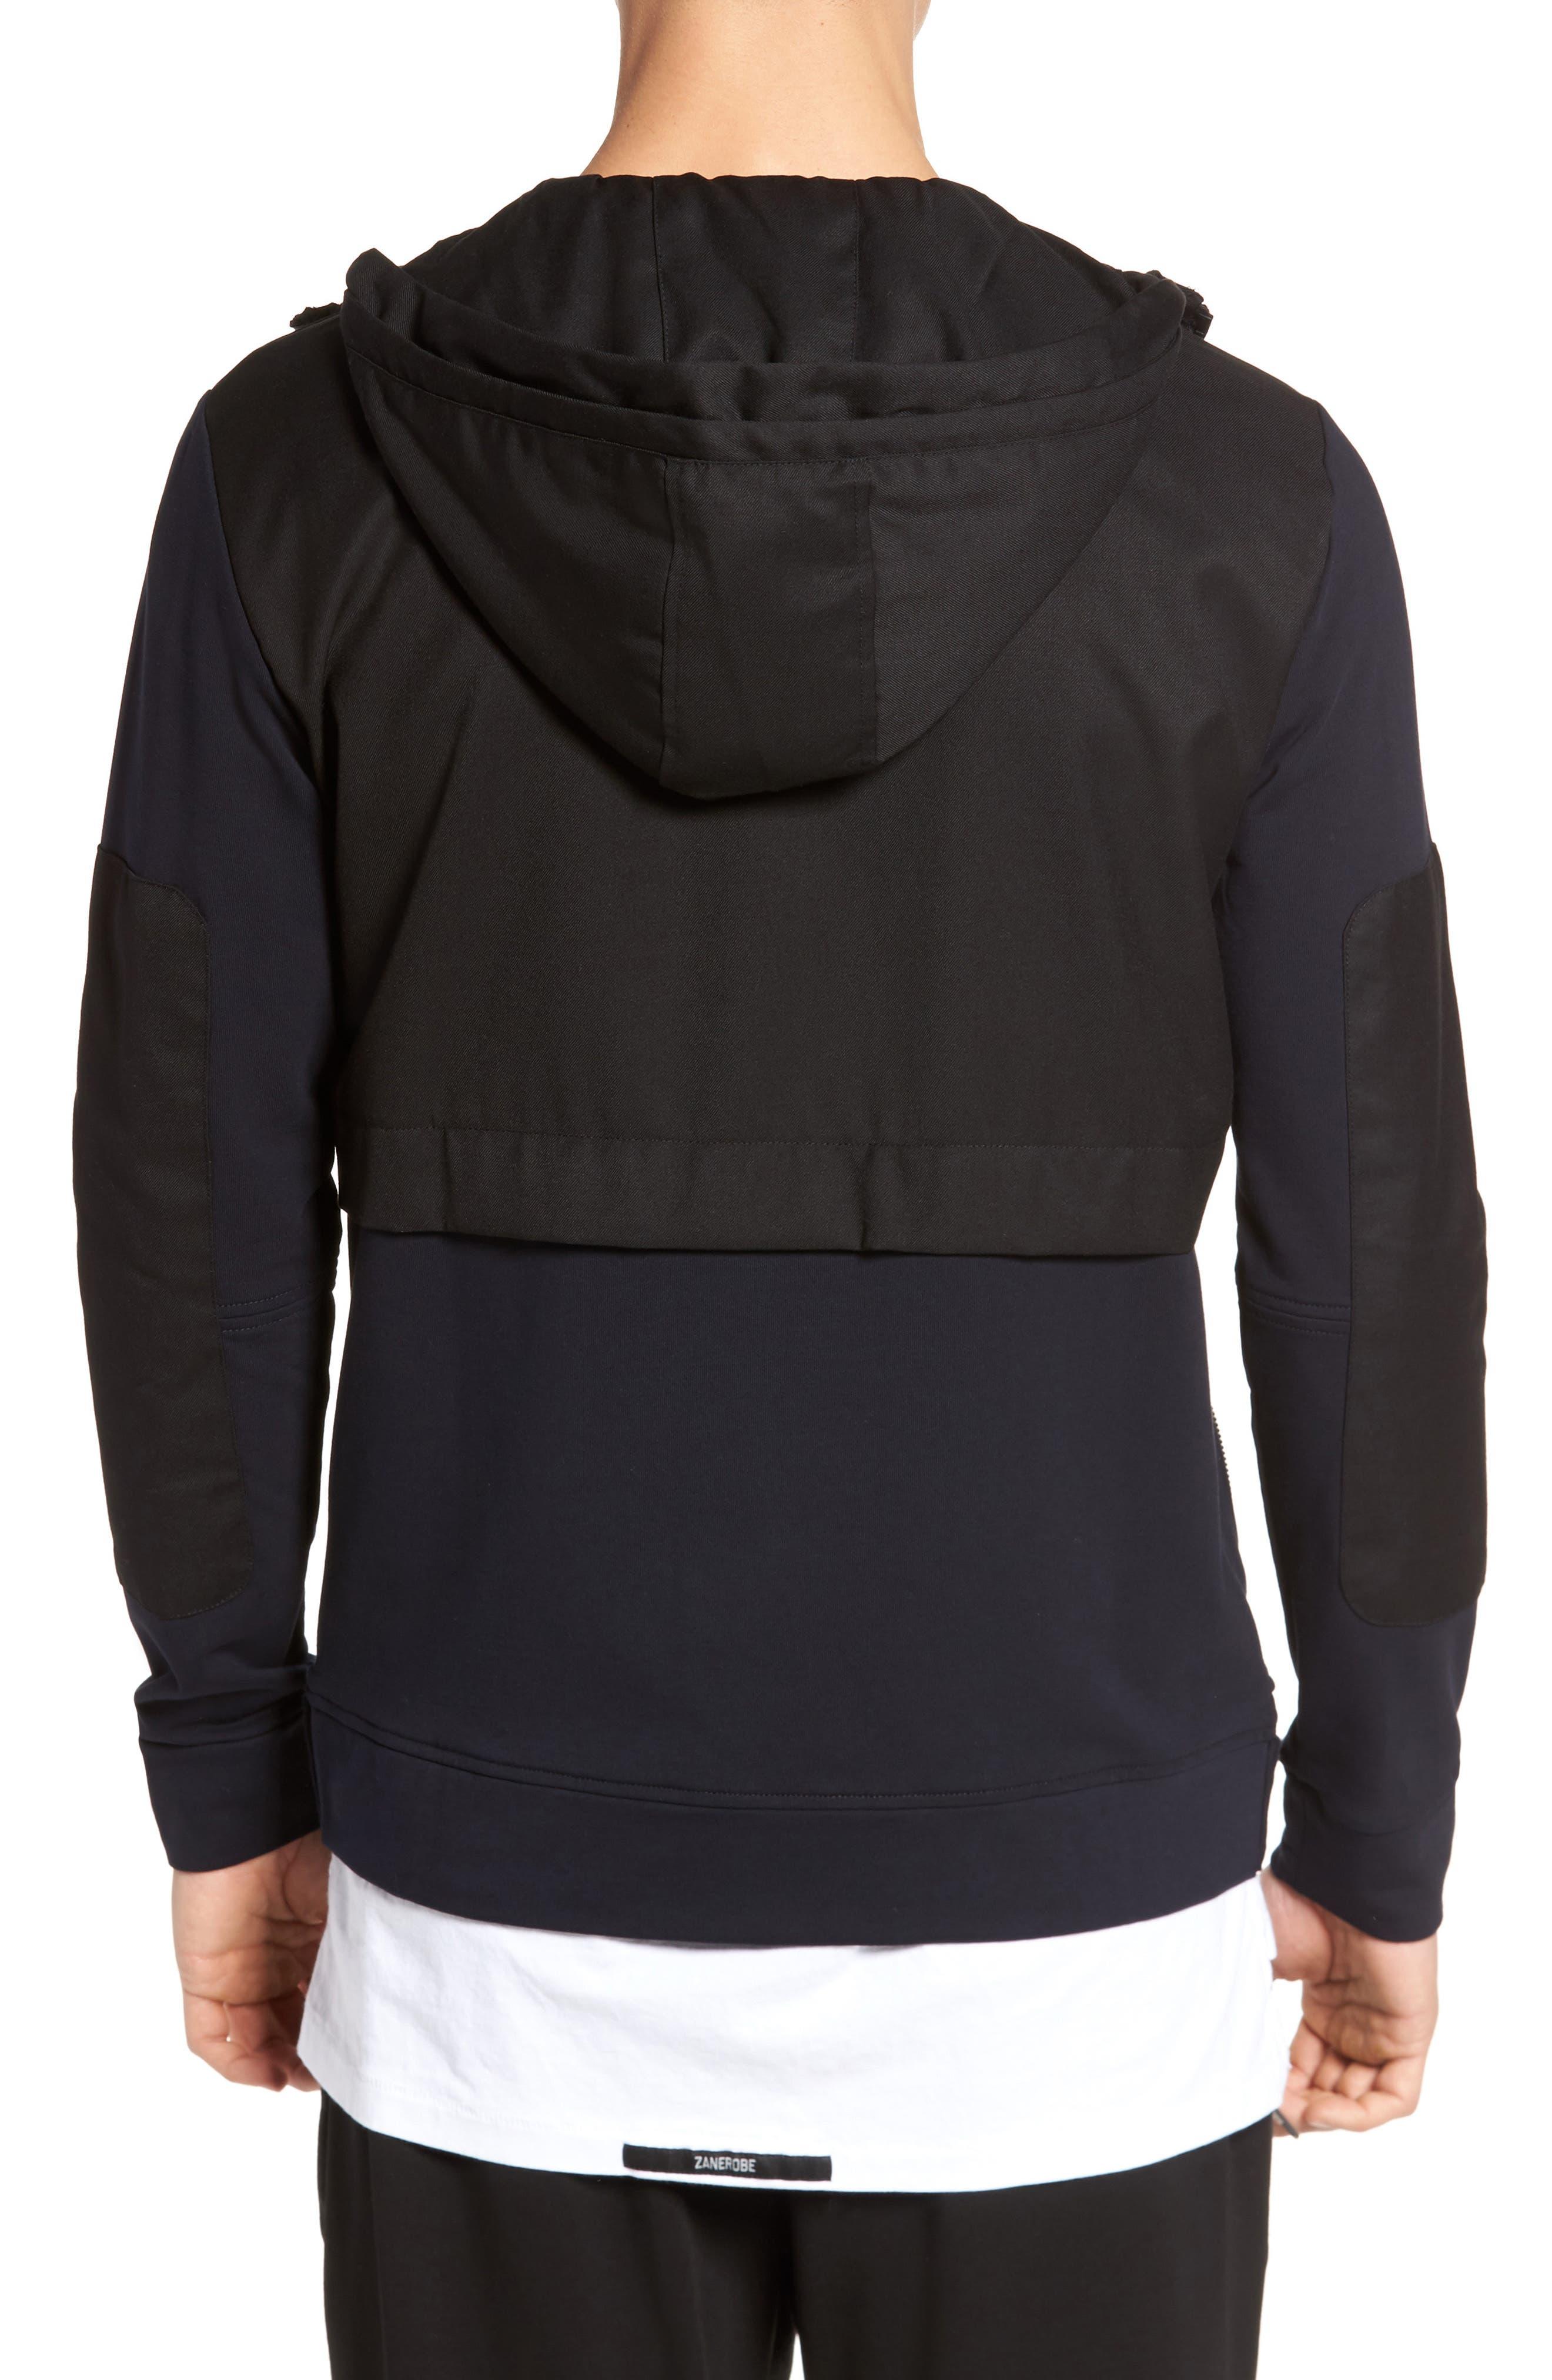 Fleece Zip Up Jacket,                             Alternate thumbnail 2, color,                             Black